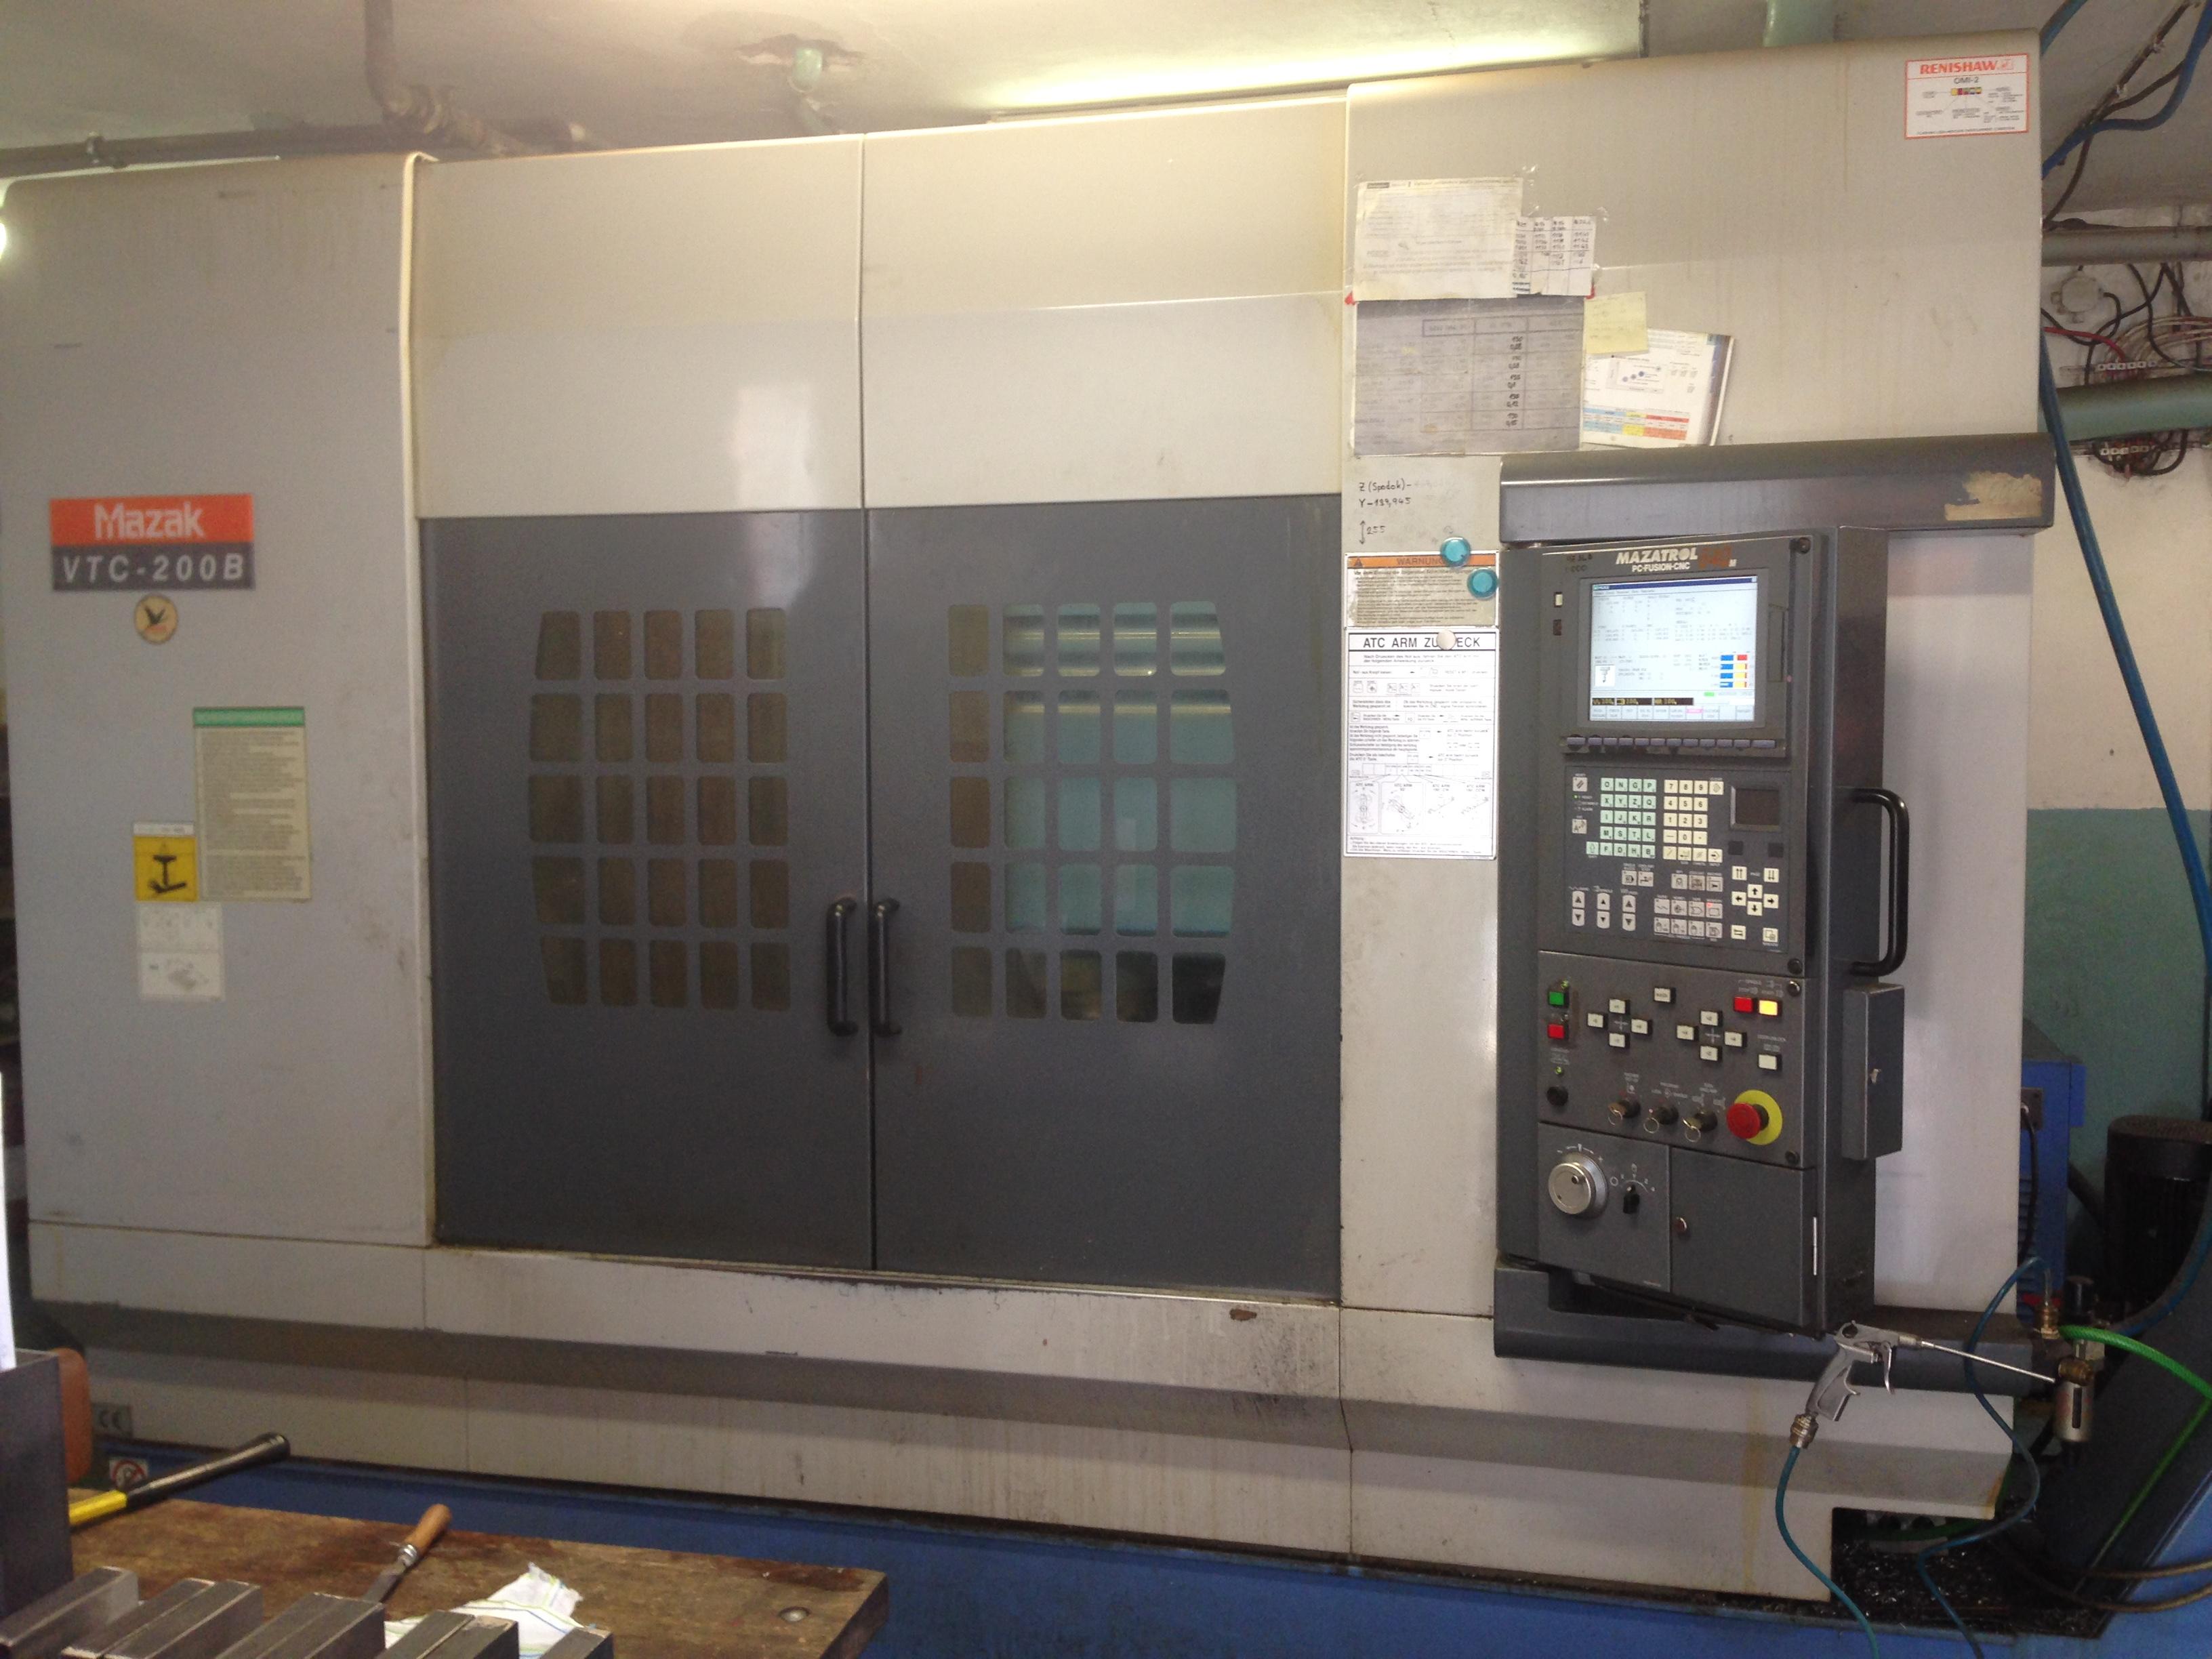 Mazak Vtc200b Cnc Vertical Milling Machine Exapro